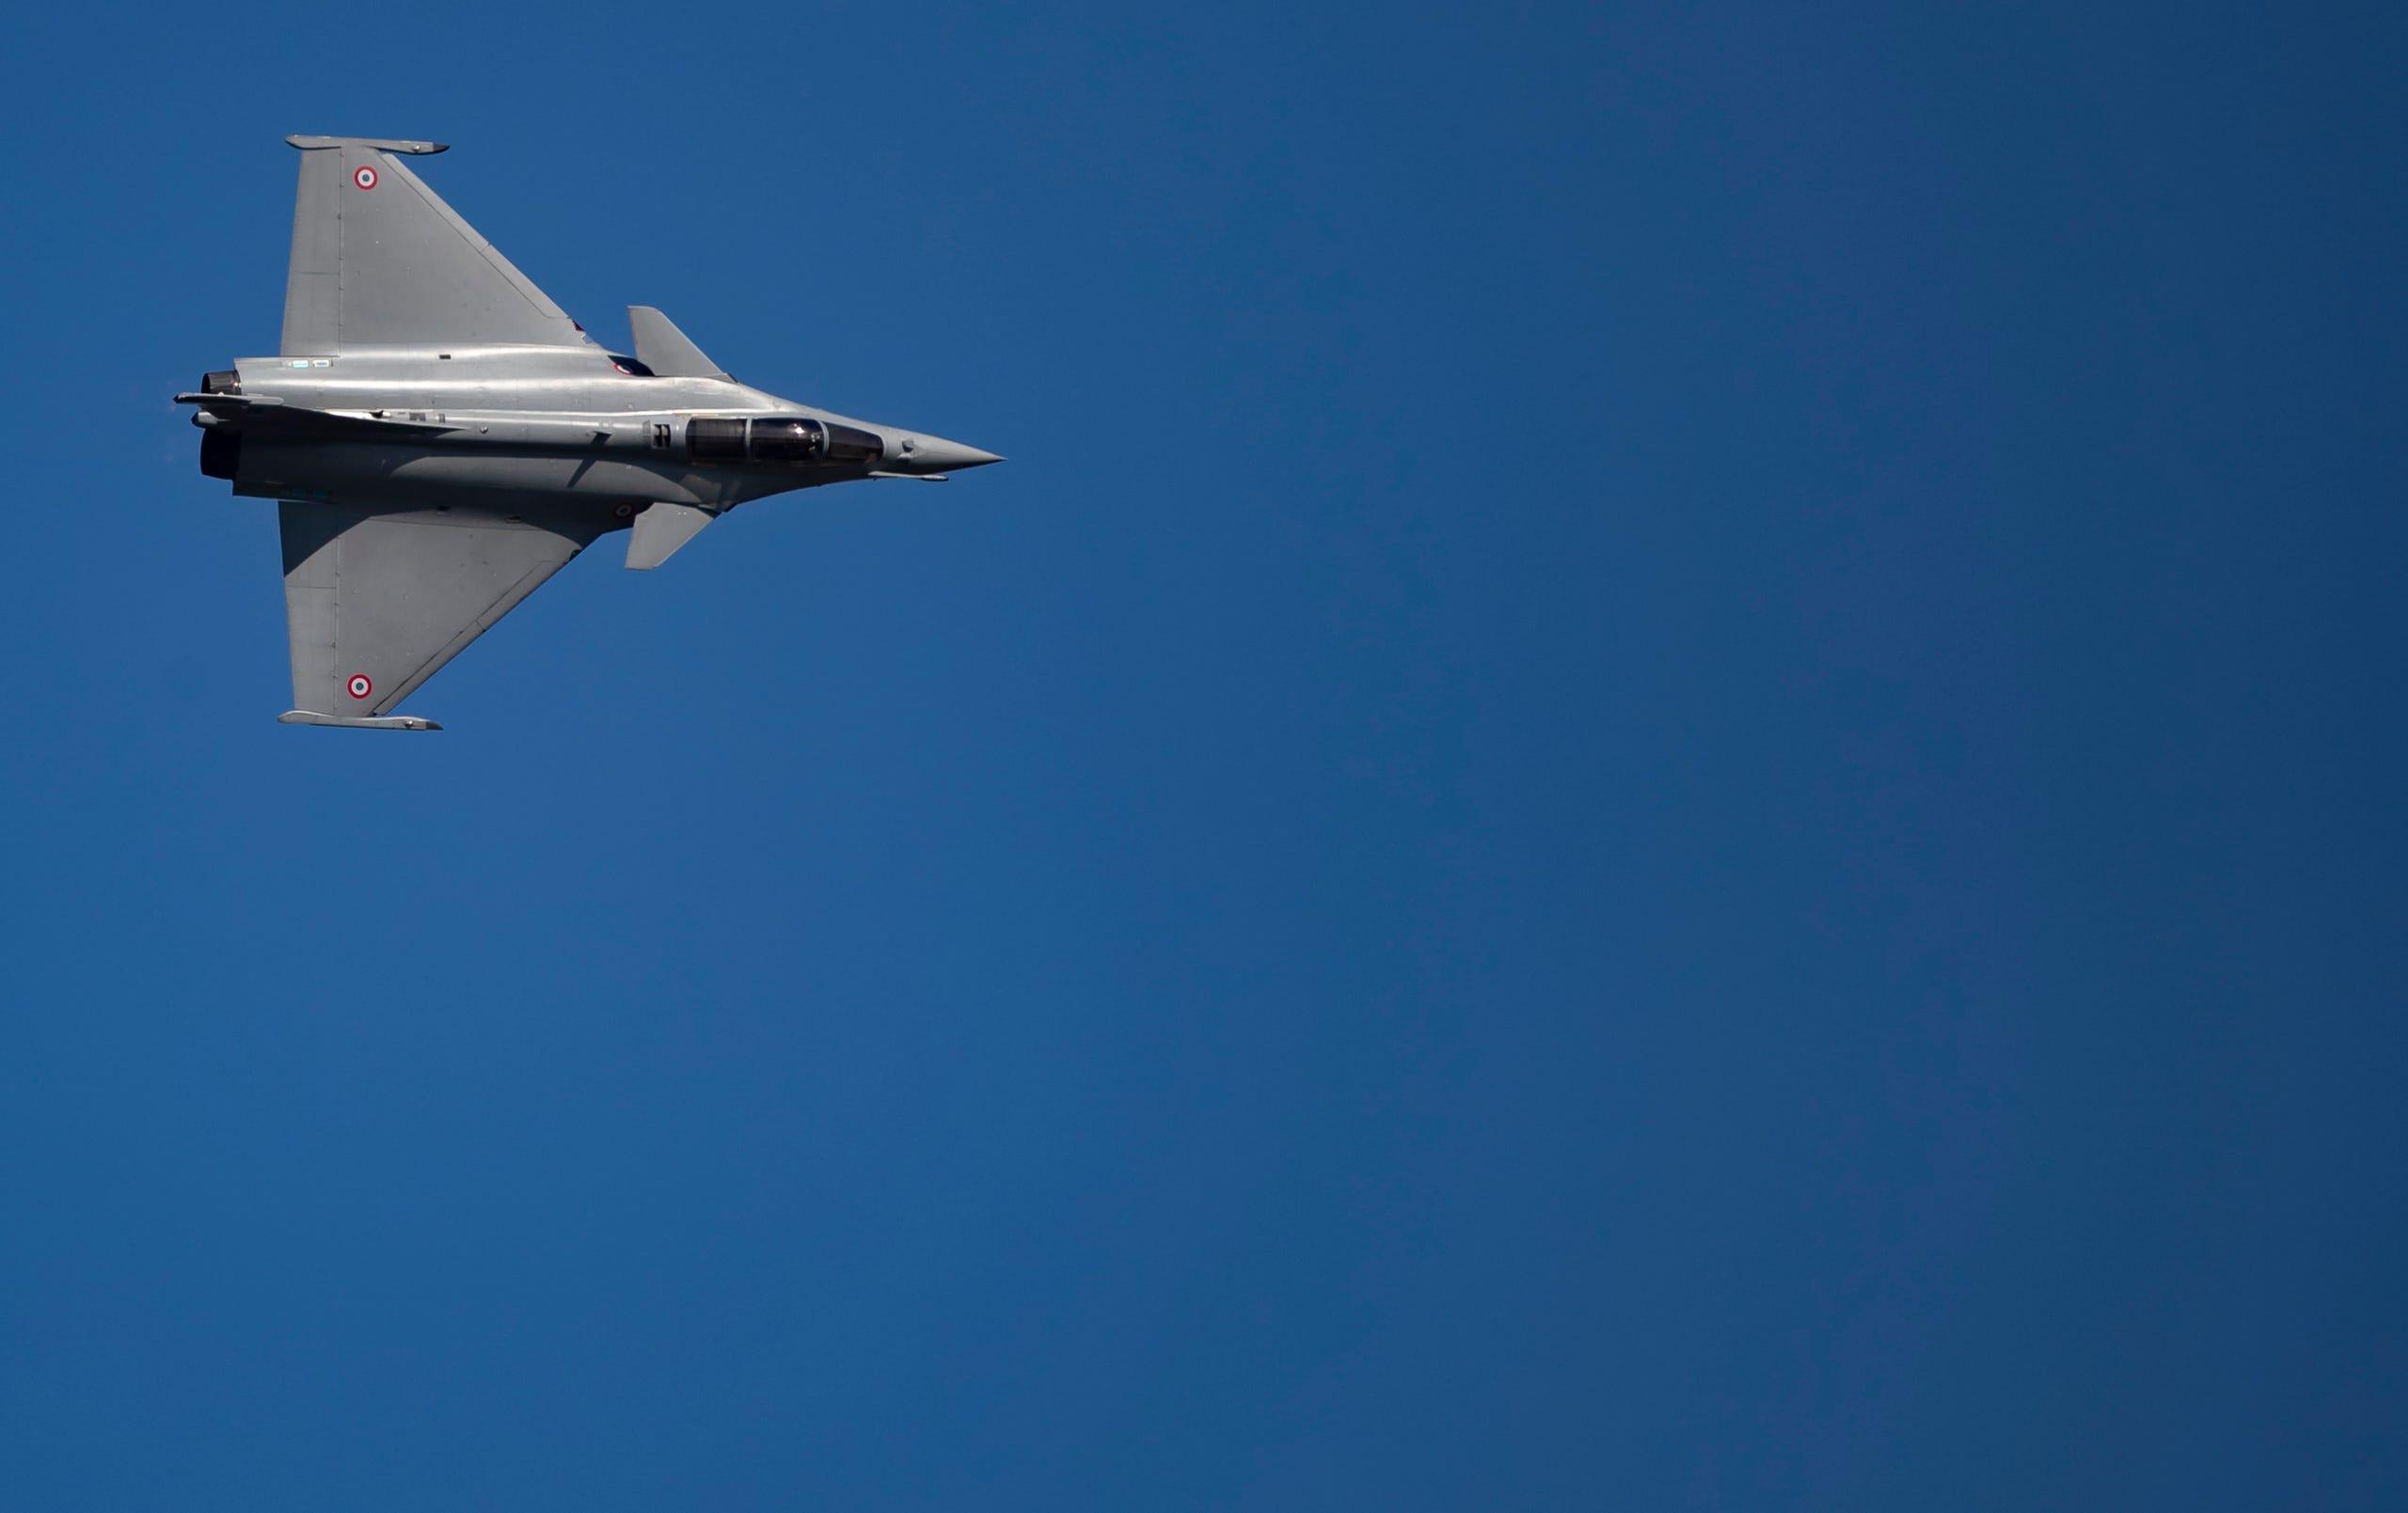 A Dassault aviation Rafale fighter jet performs, June 17, 2019.